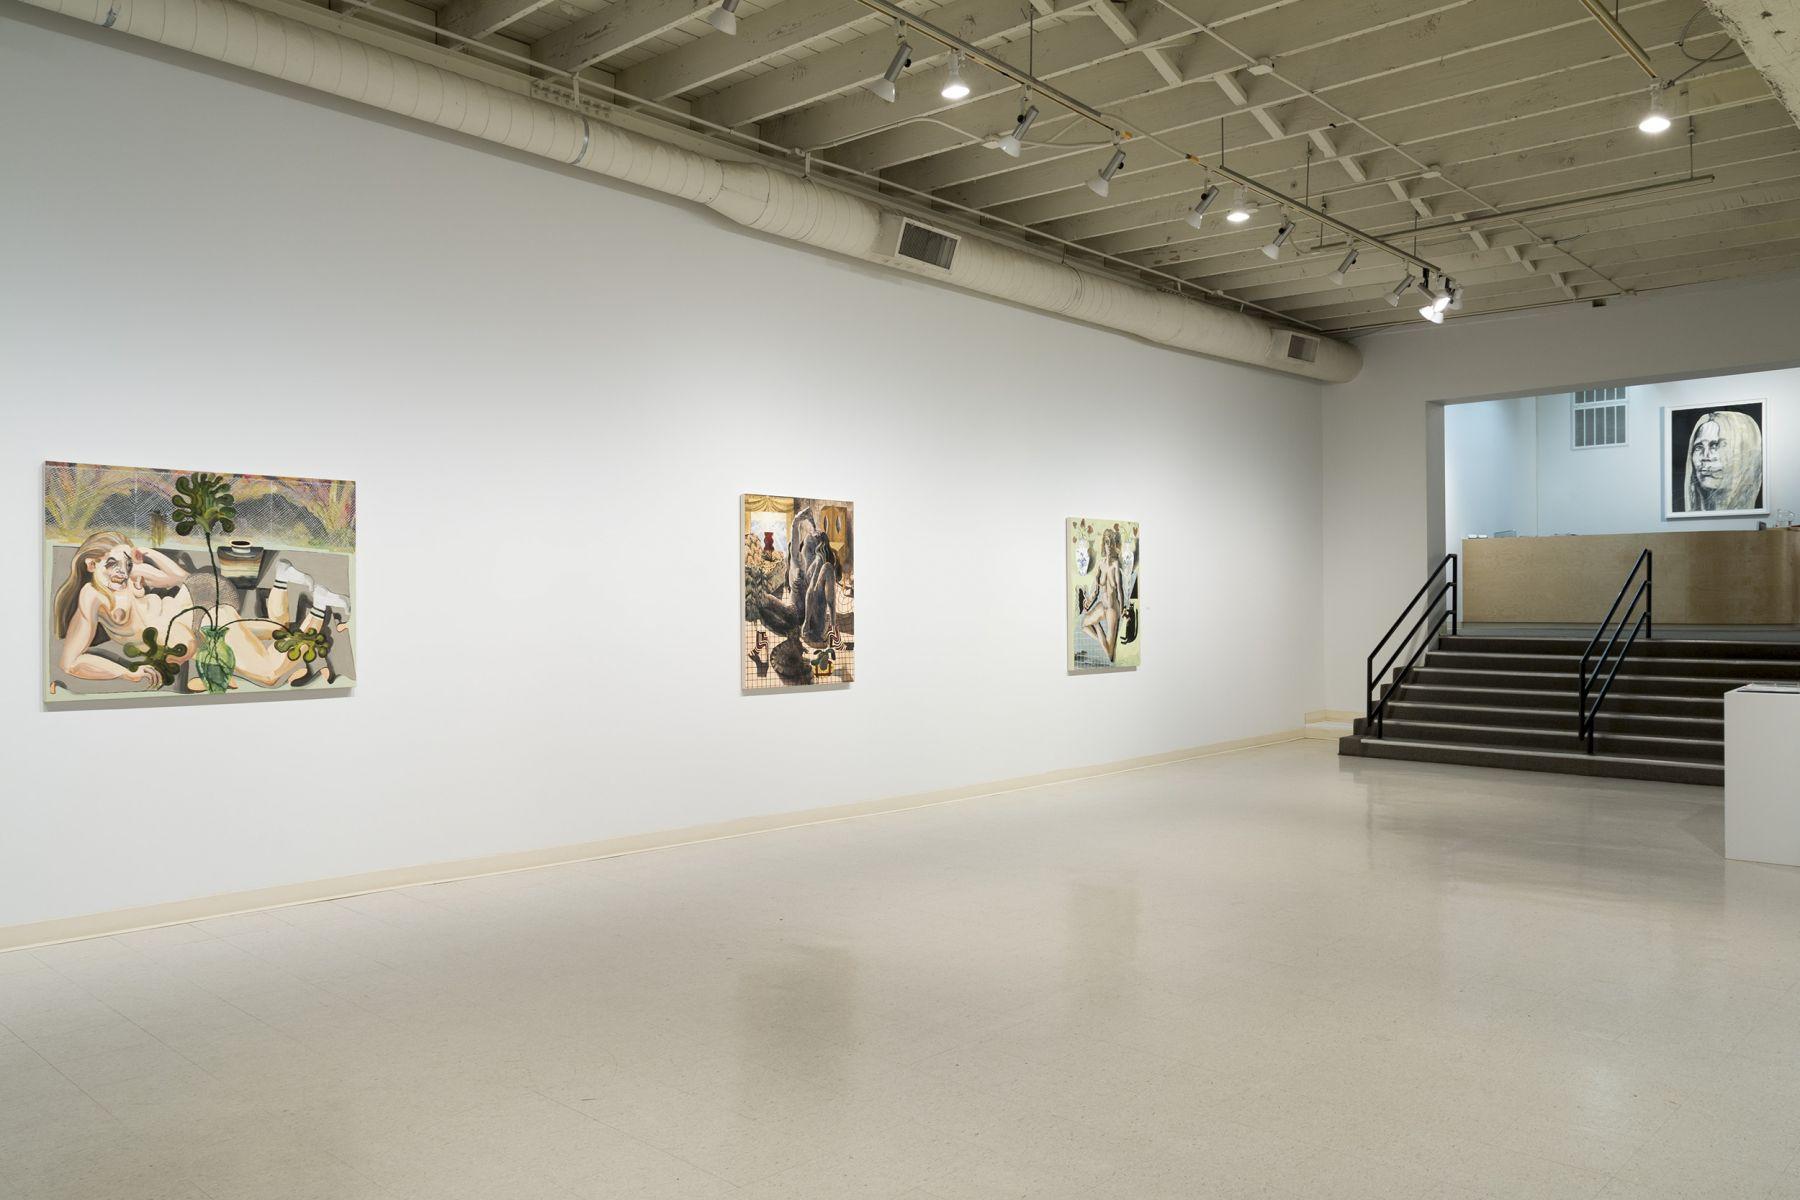 Elizabeth Malaska | Heavenly Bodies | Installation View 5